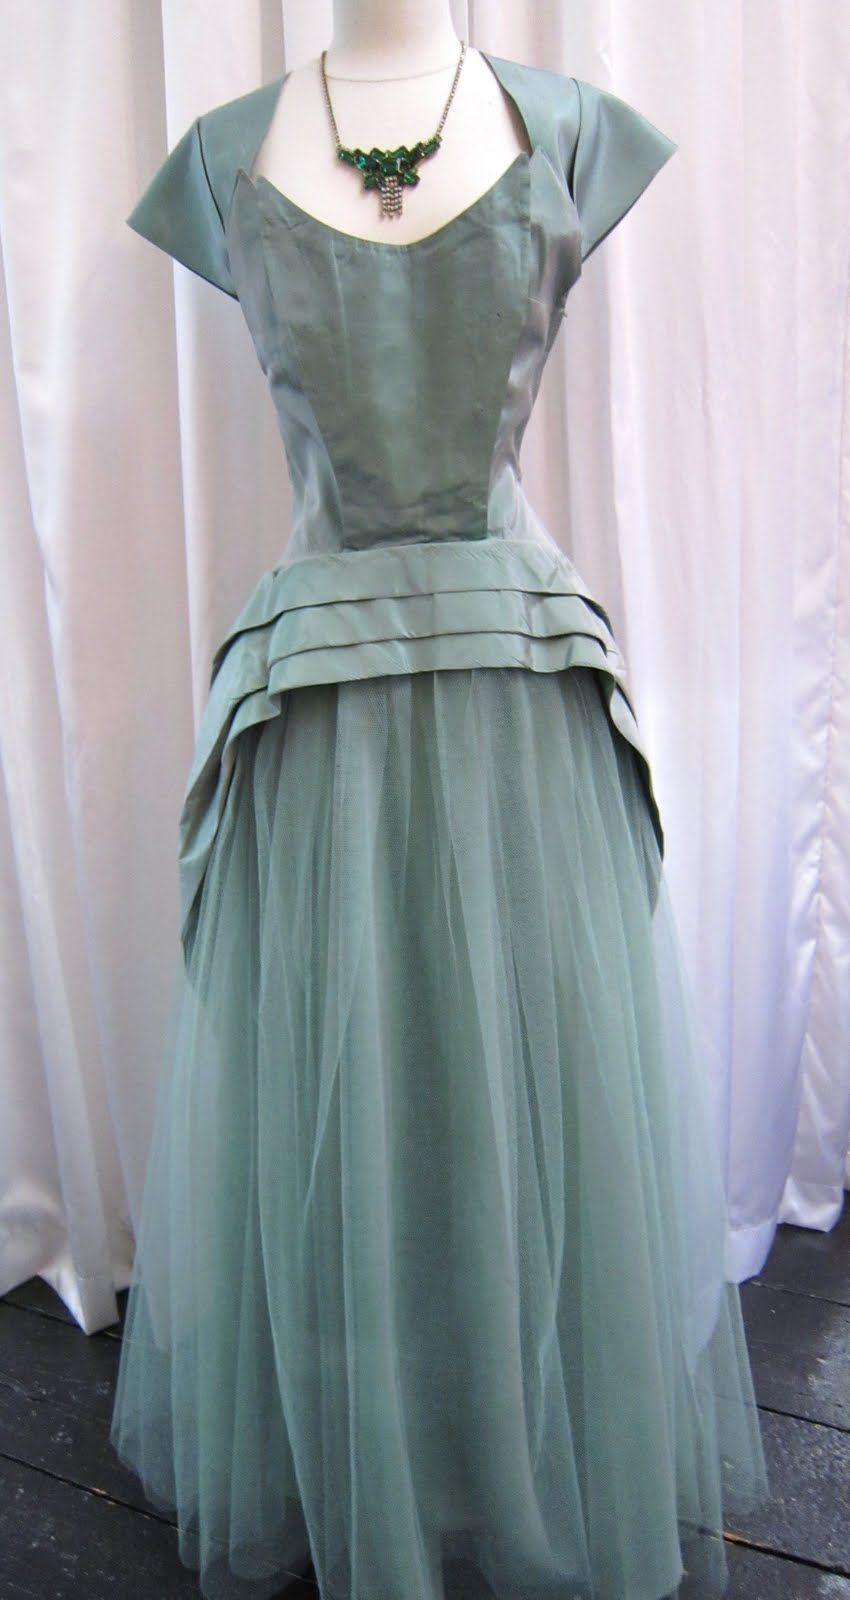 1950s Sage Green Taffeta Gown Evening Dresses Vintage Evening Dresses Vintage Dress Details [ 1600 x 850 Pixel ]